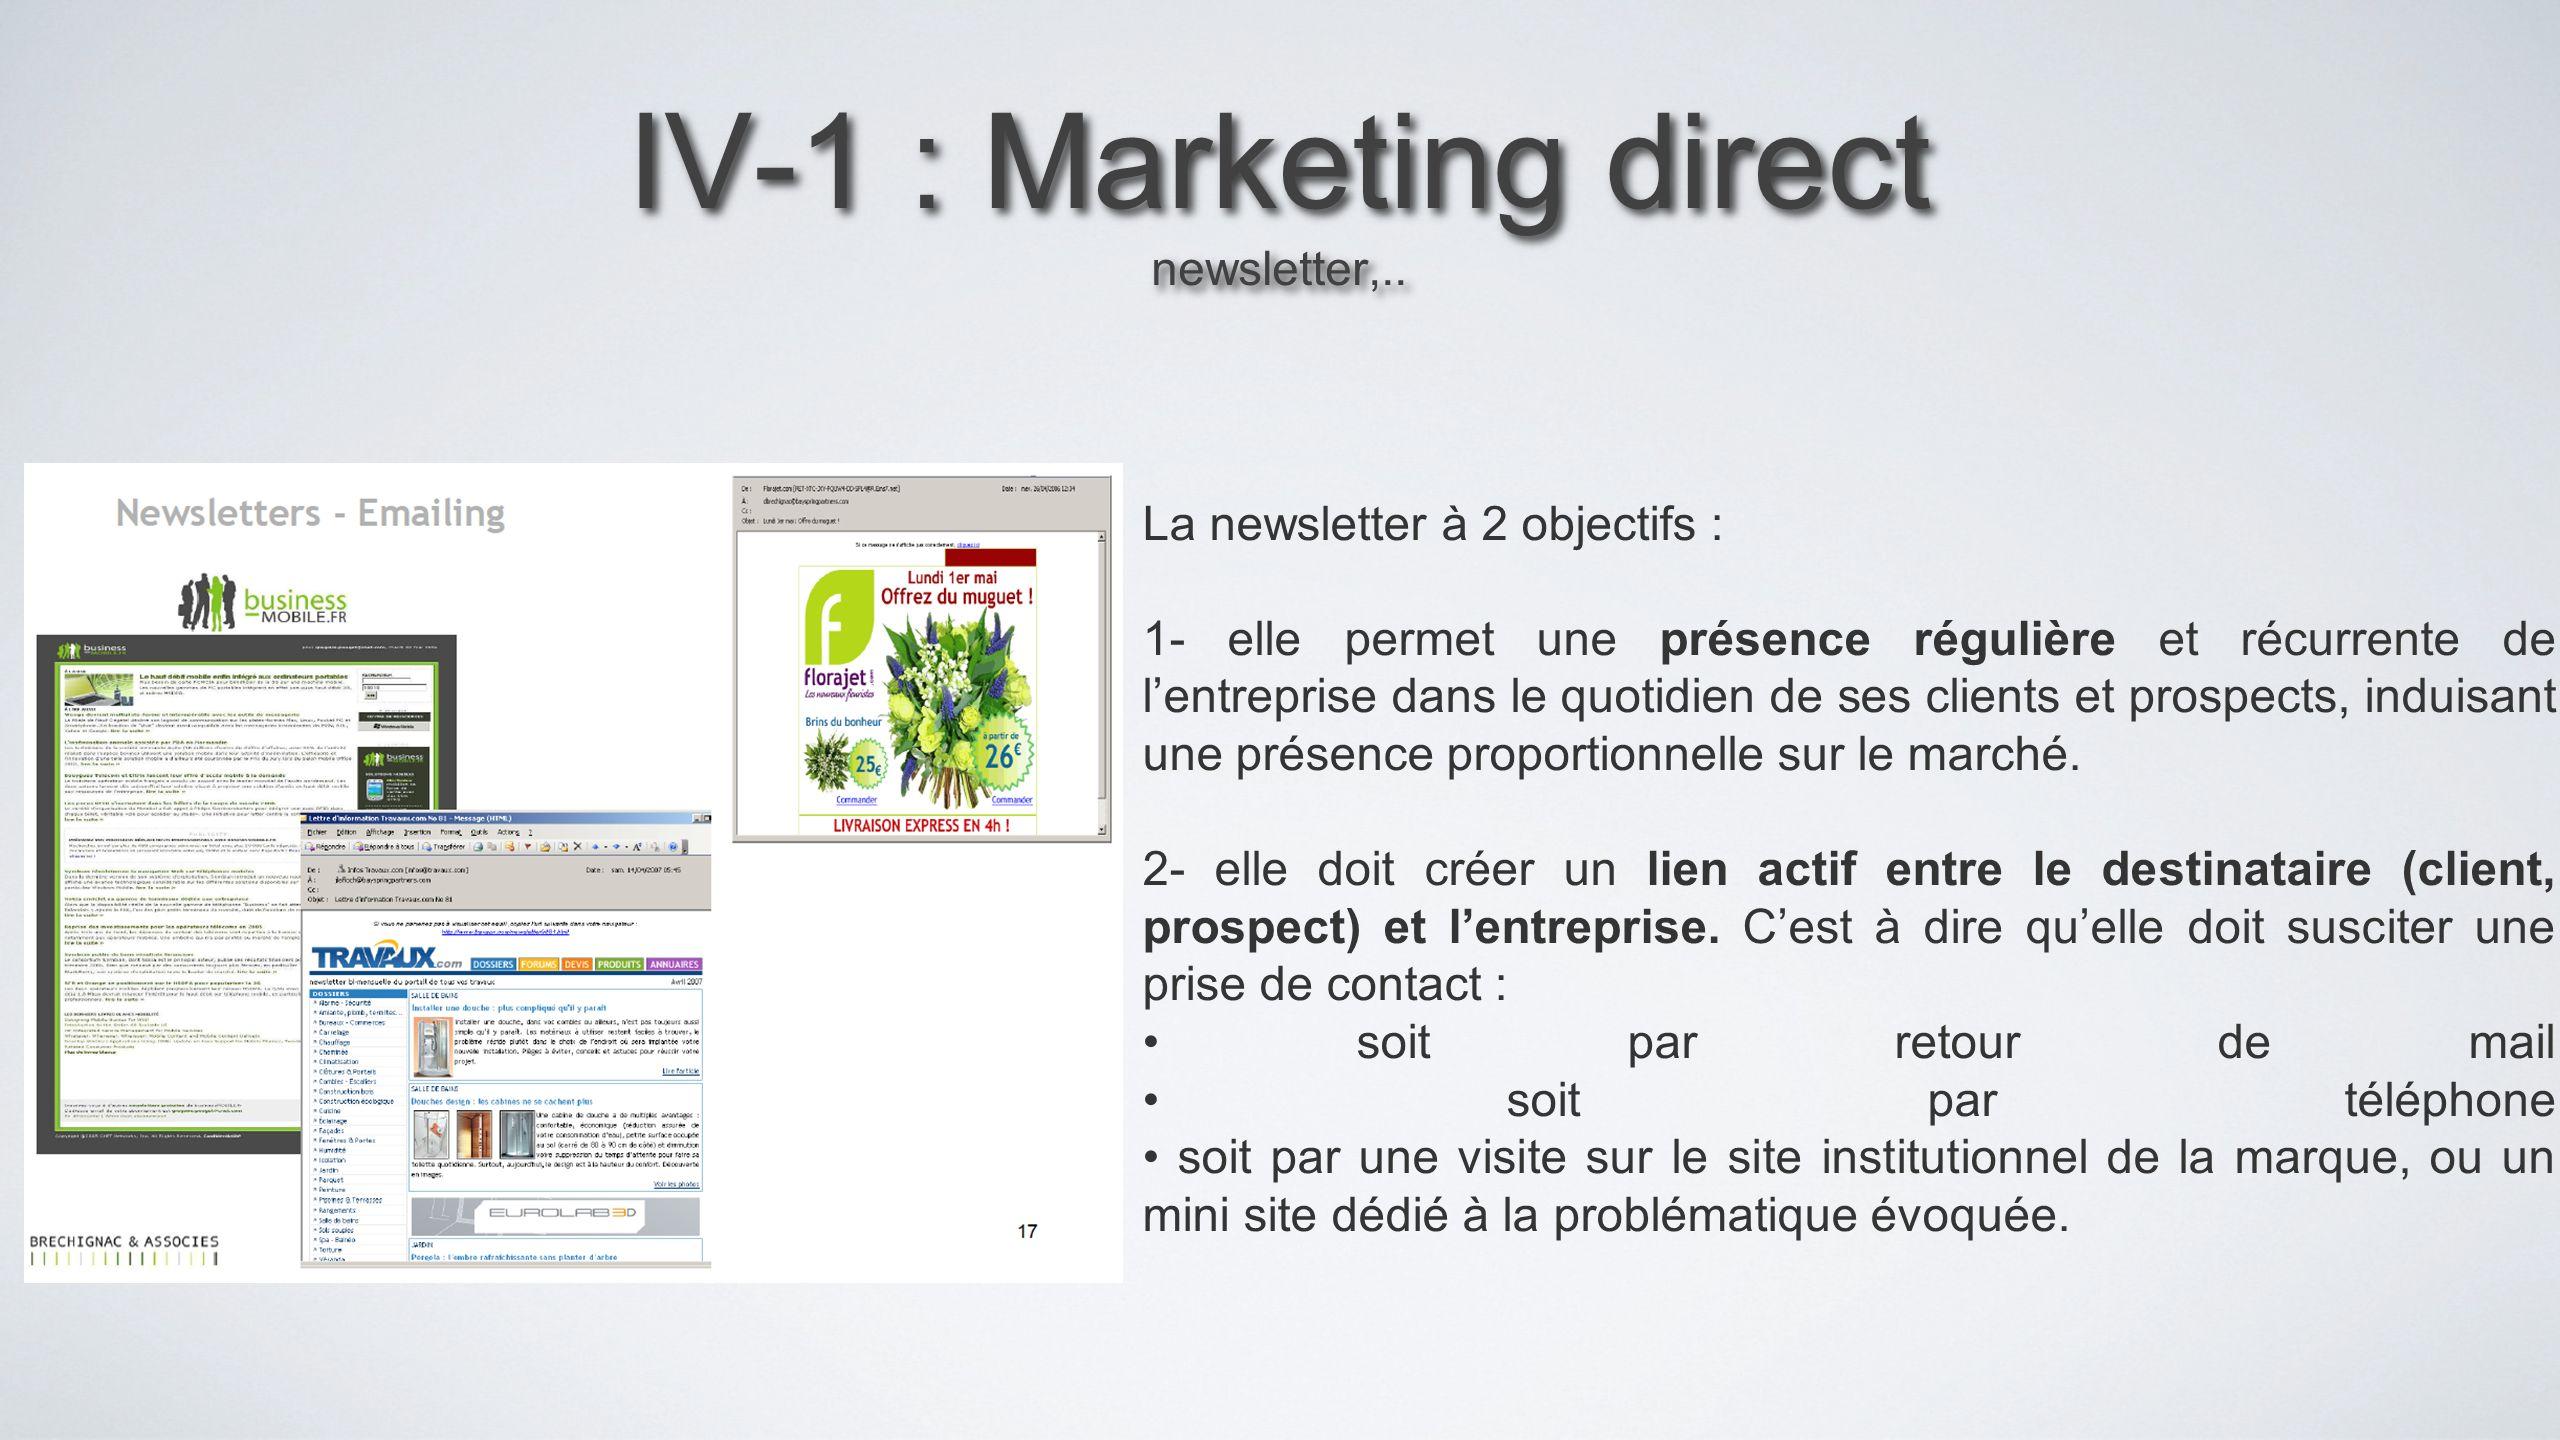 IV-1 : Marketing direct newsletter,..